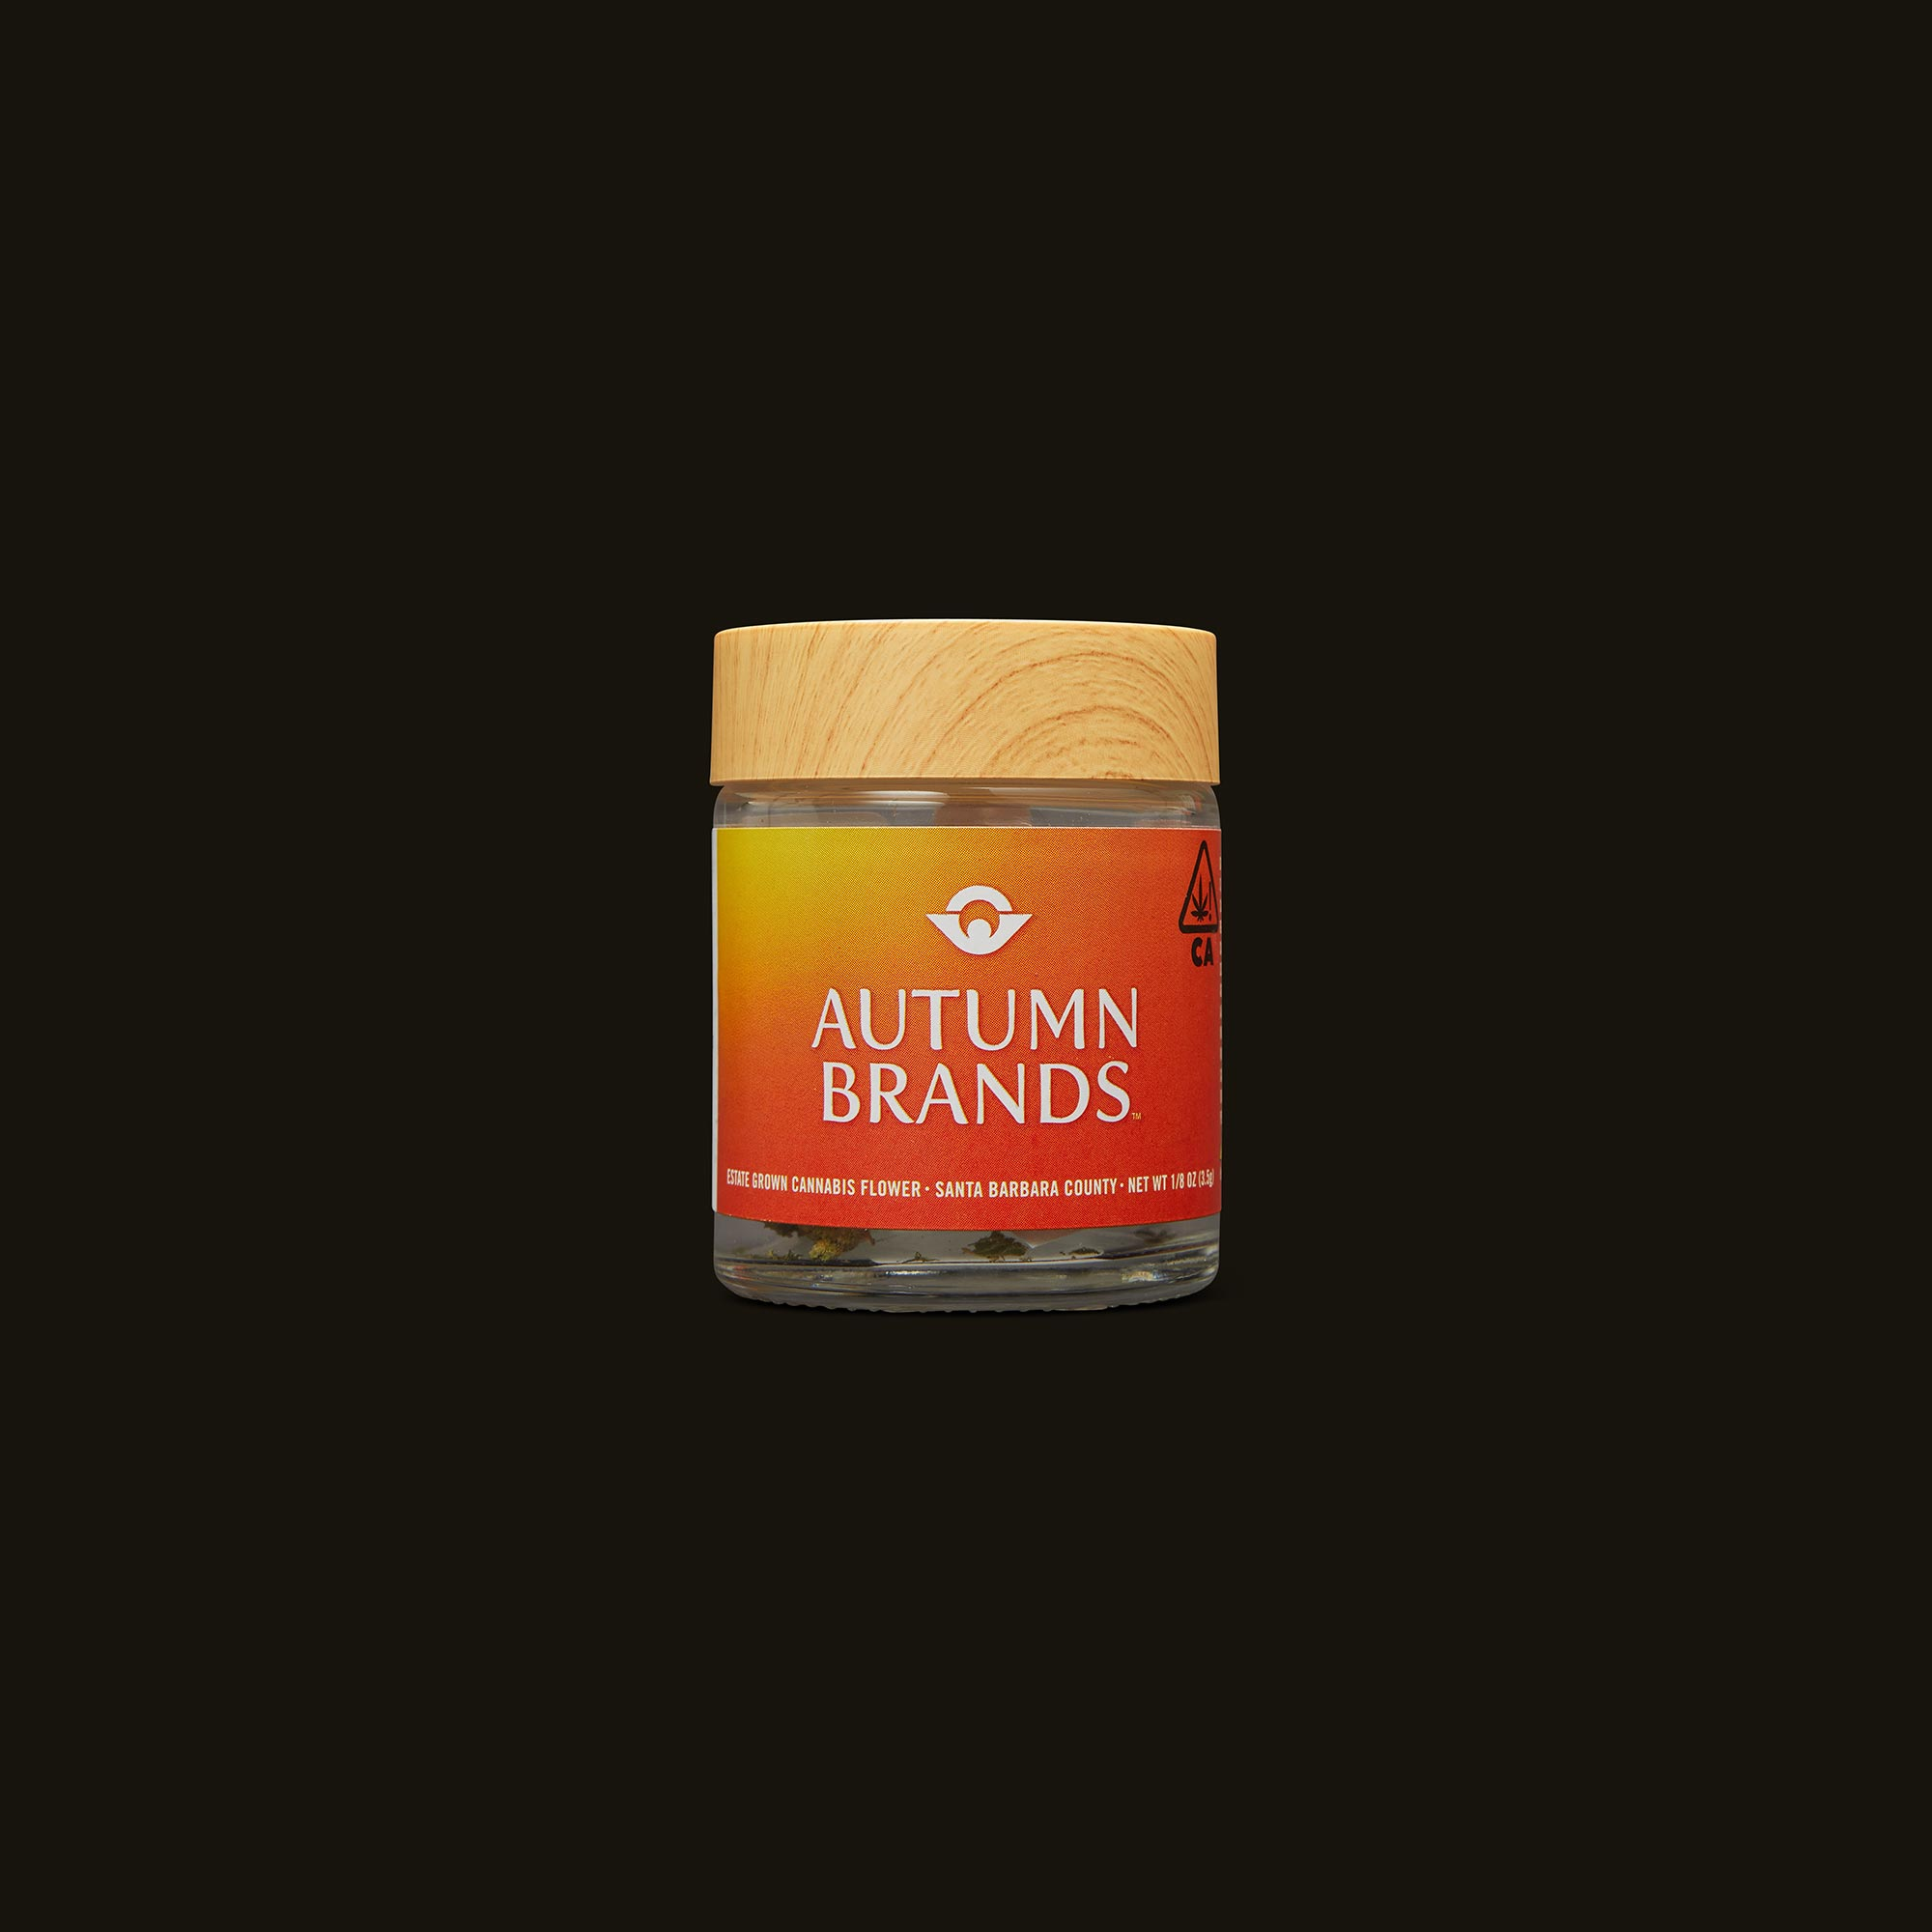 Autumn Brands GG #4 Front Packaging